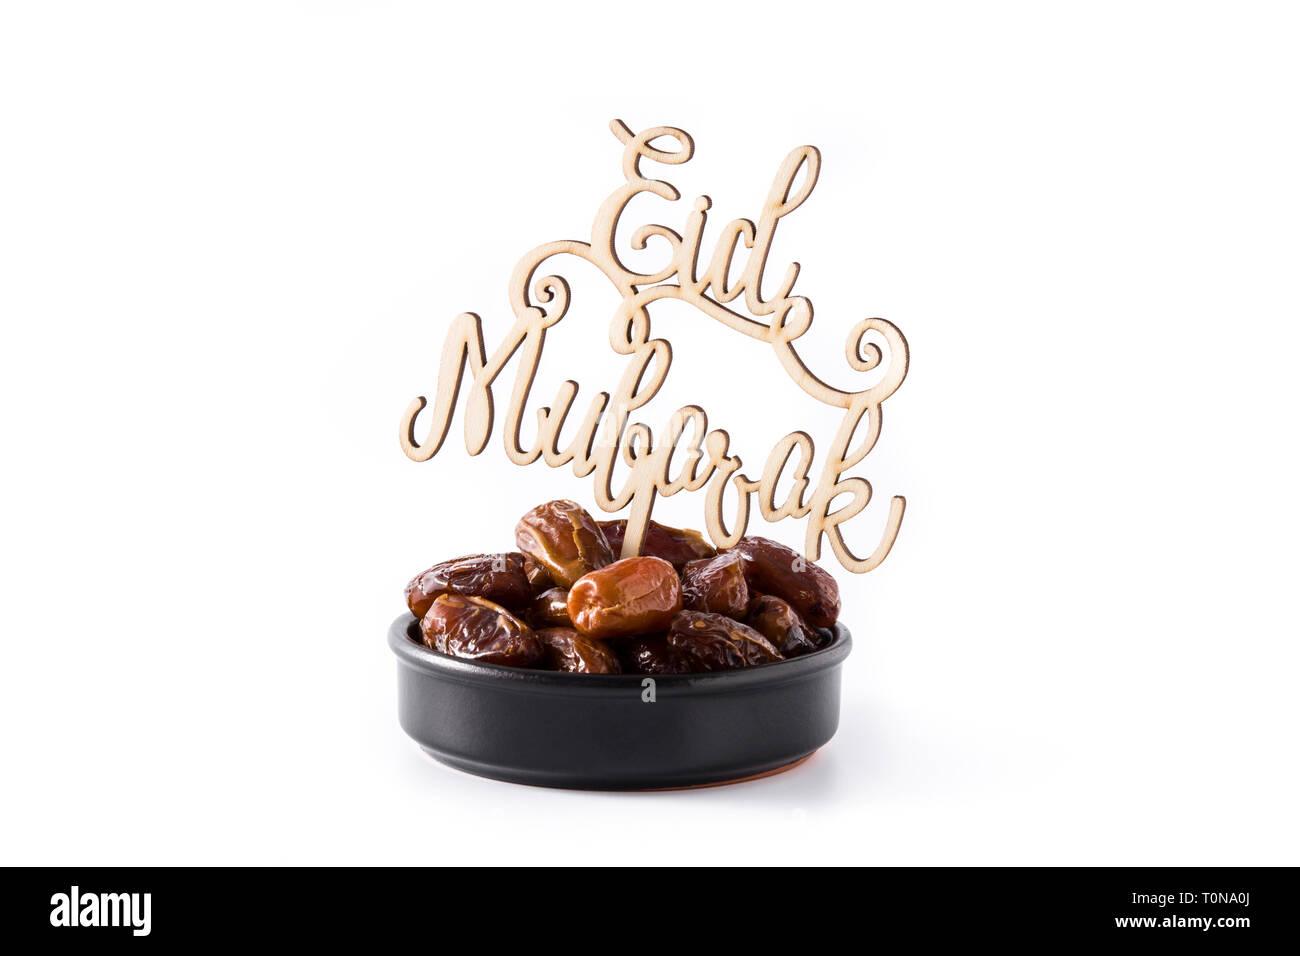 Fechas y Eid Mubarak mensaje aislado sobre fondo blanco. Foto de stock